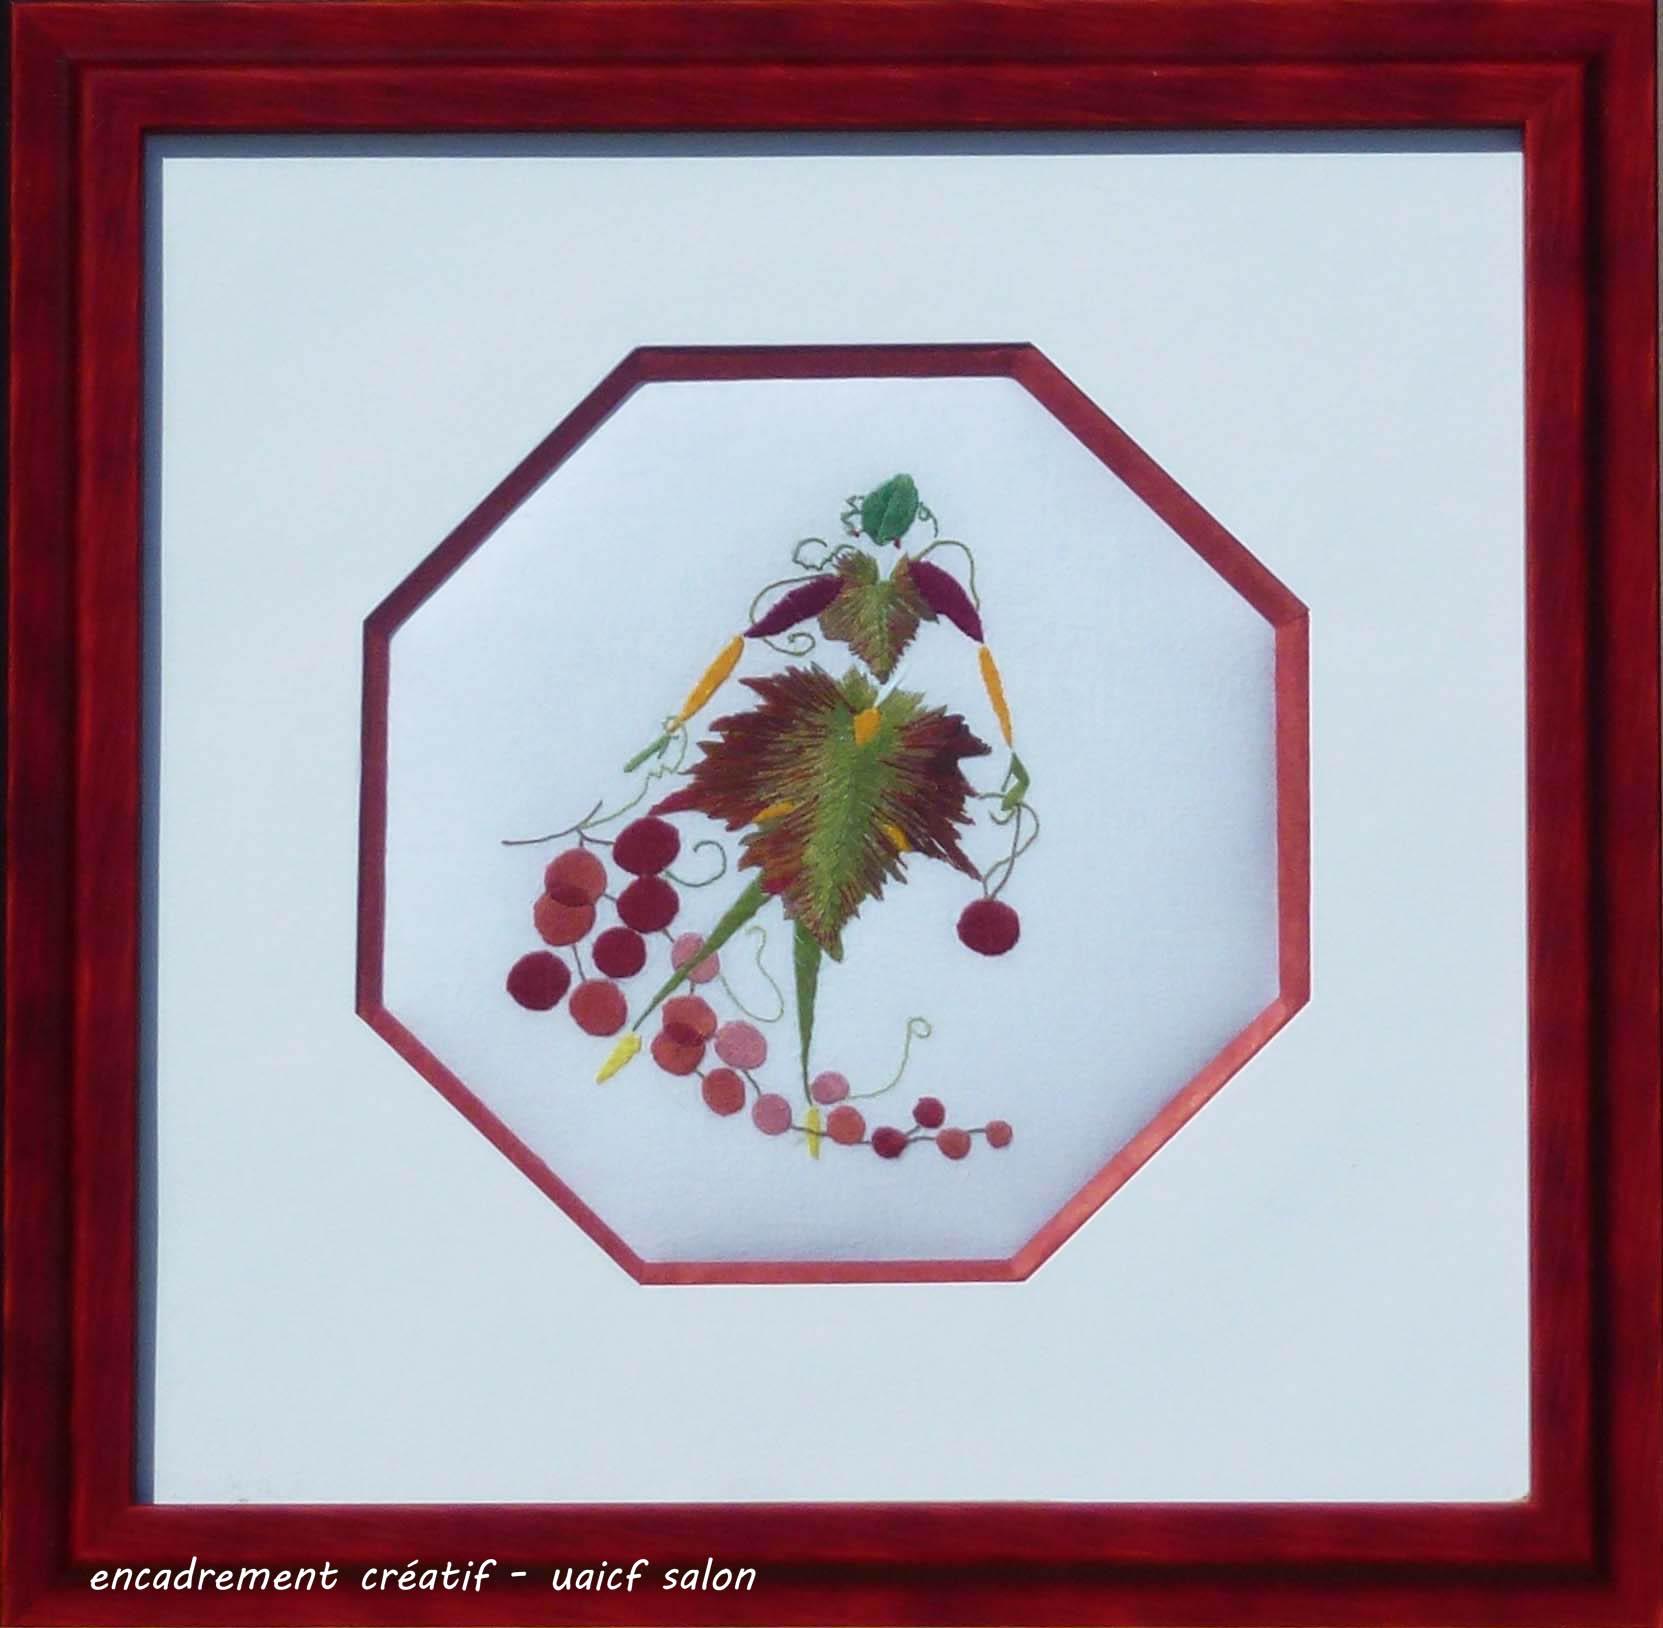 Broderie femme feuille de vigne